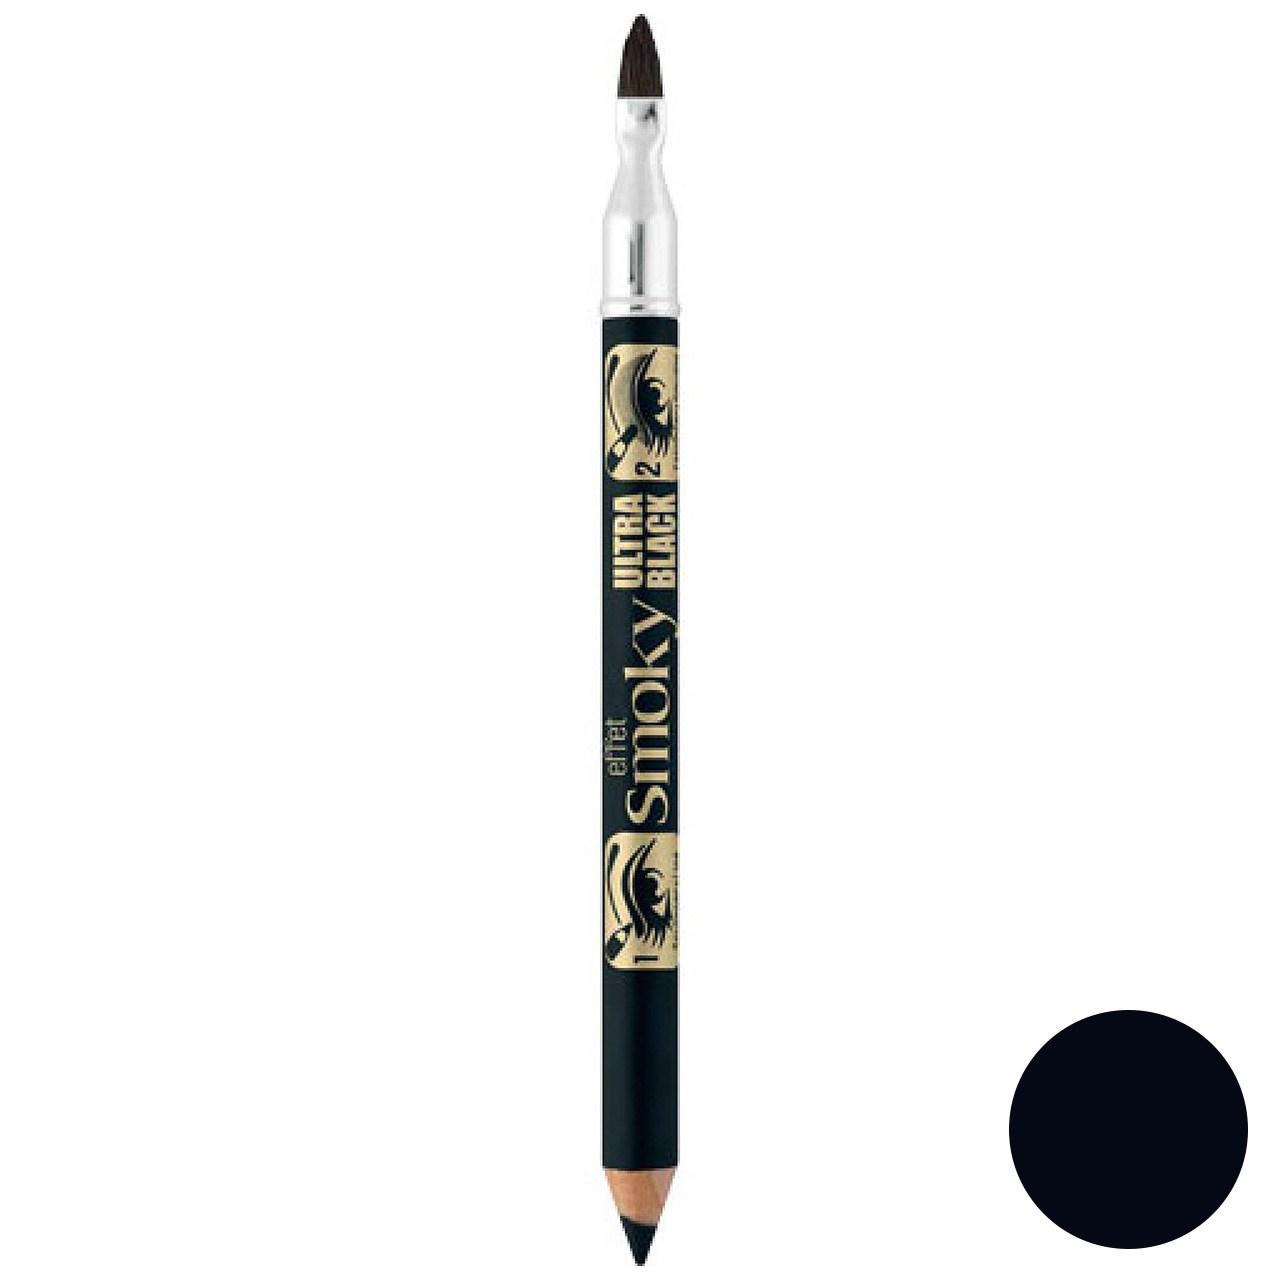 Bourjois Effet Smoky Ultra Black Eye Pencil Eyeliner Liner Stylo 61 76